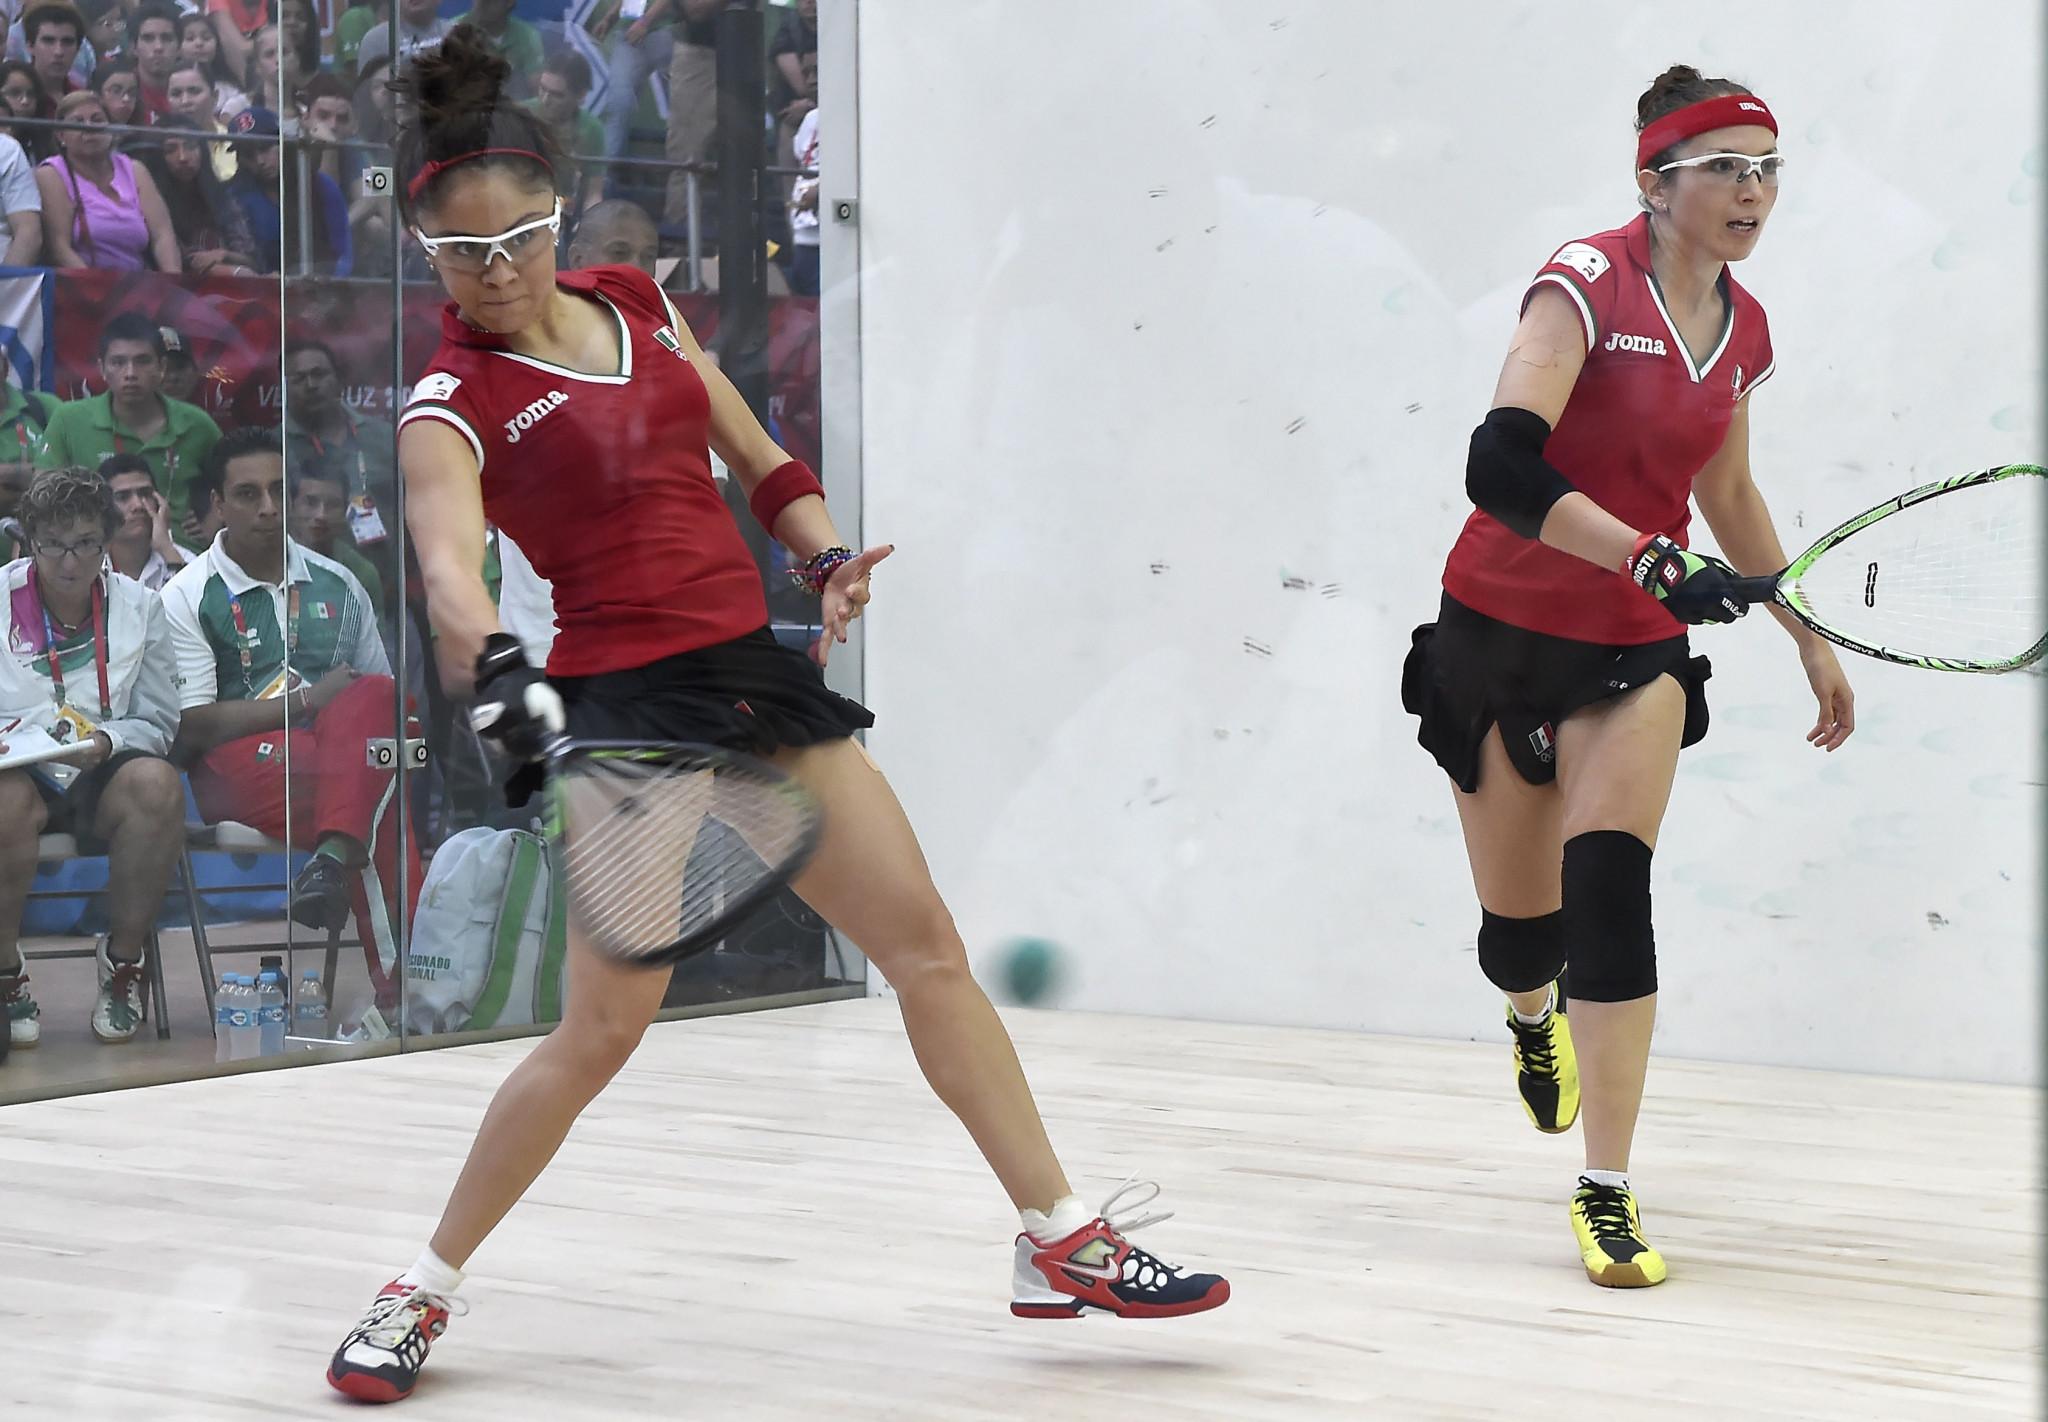 Group play continues at World Racquetball Championships